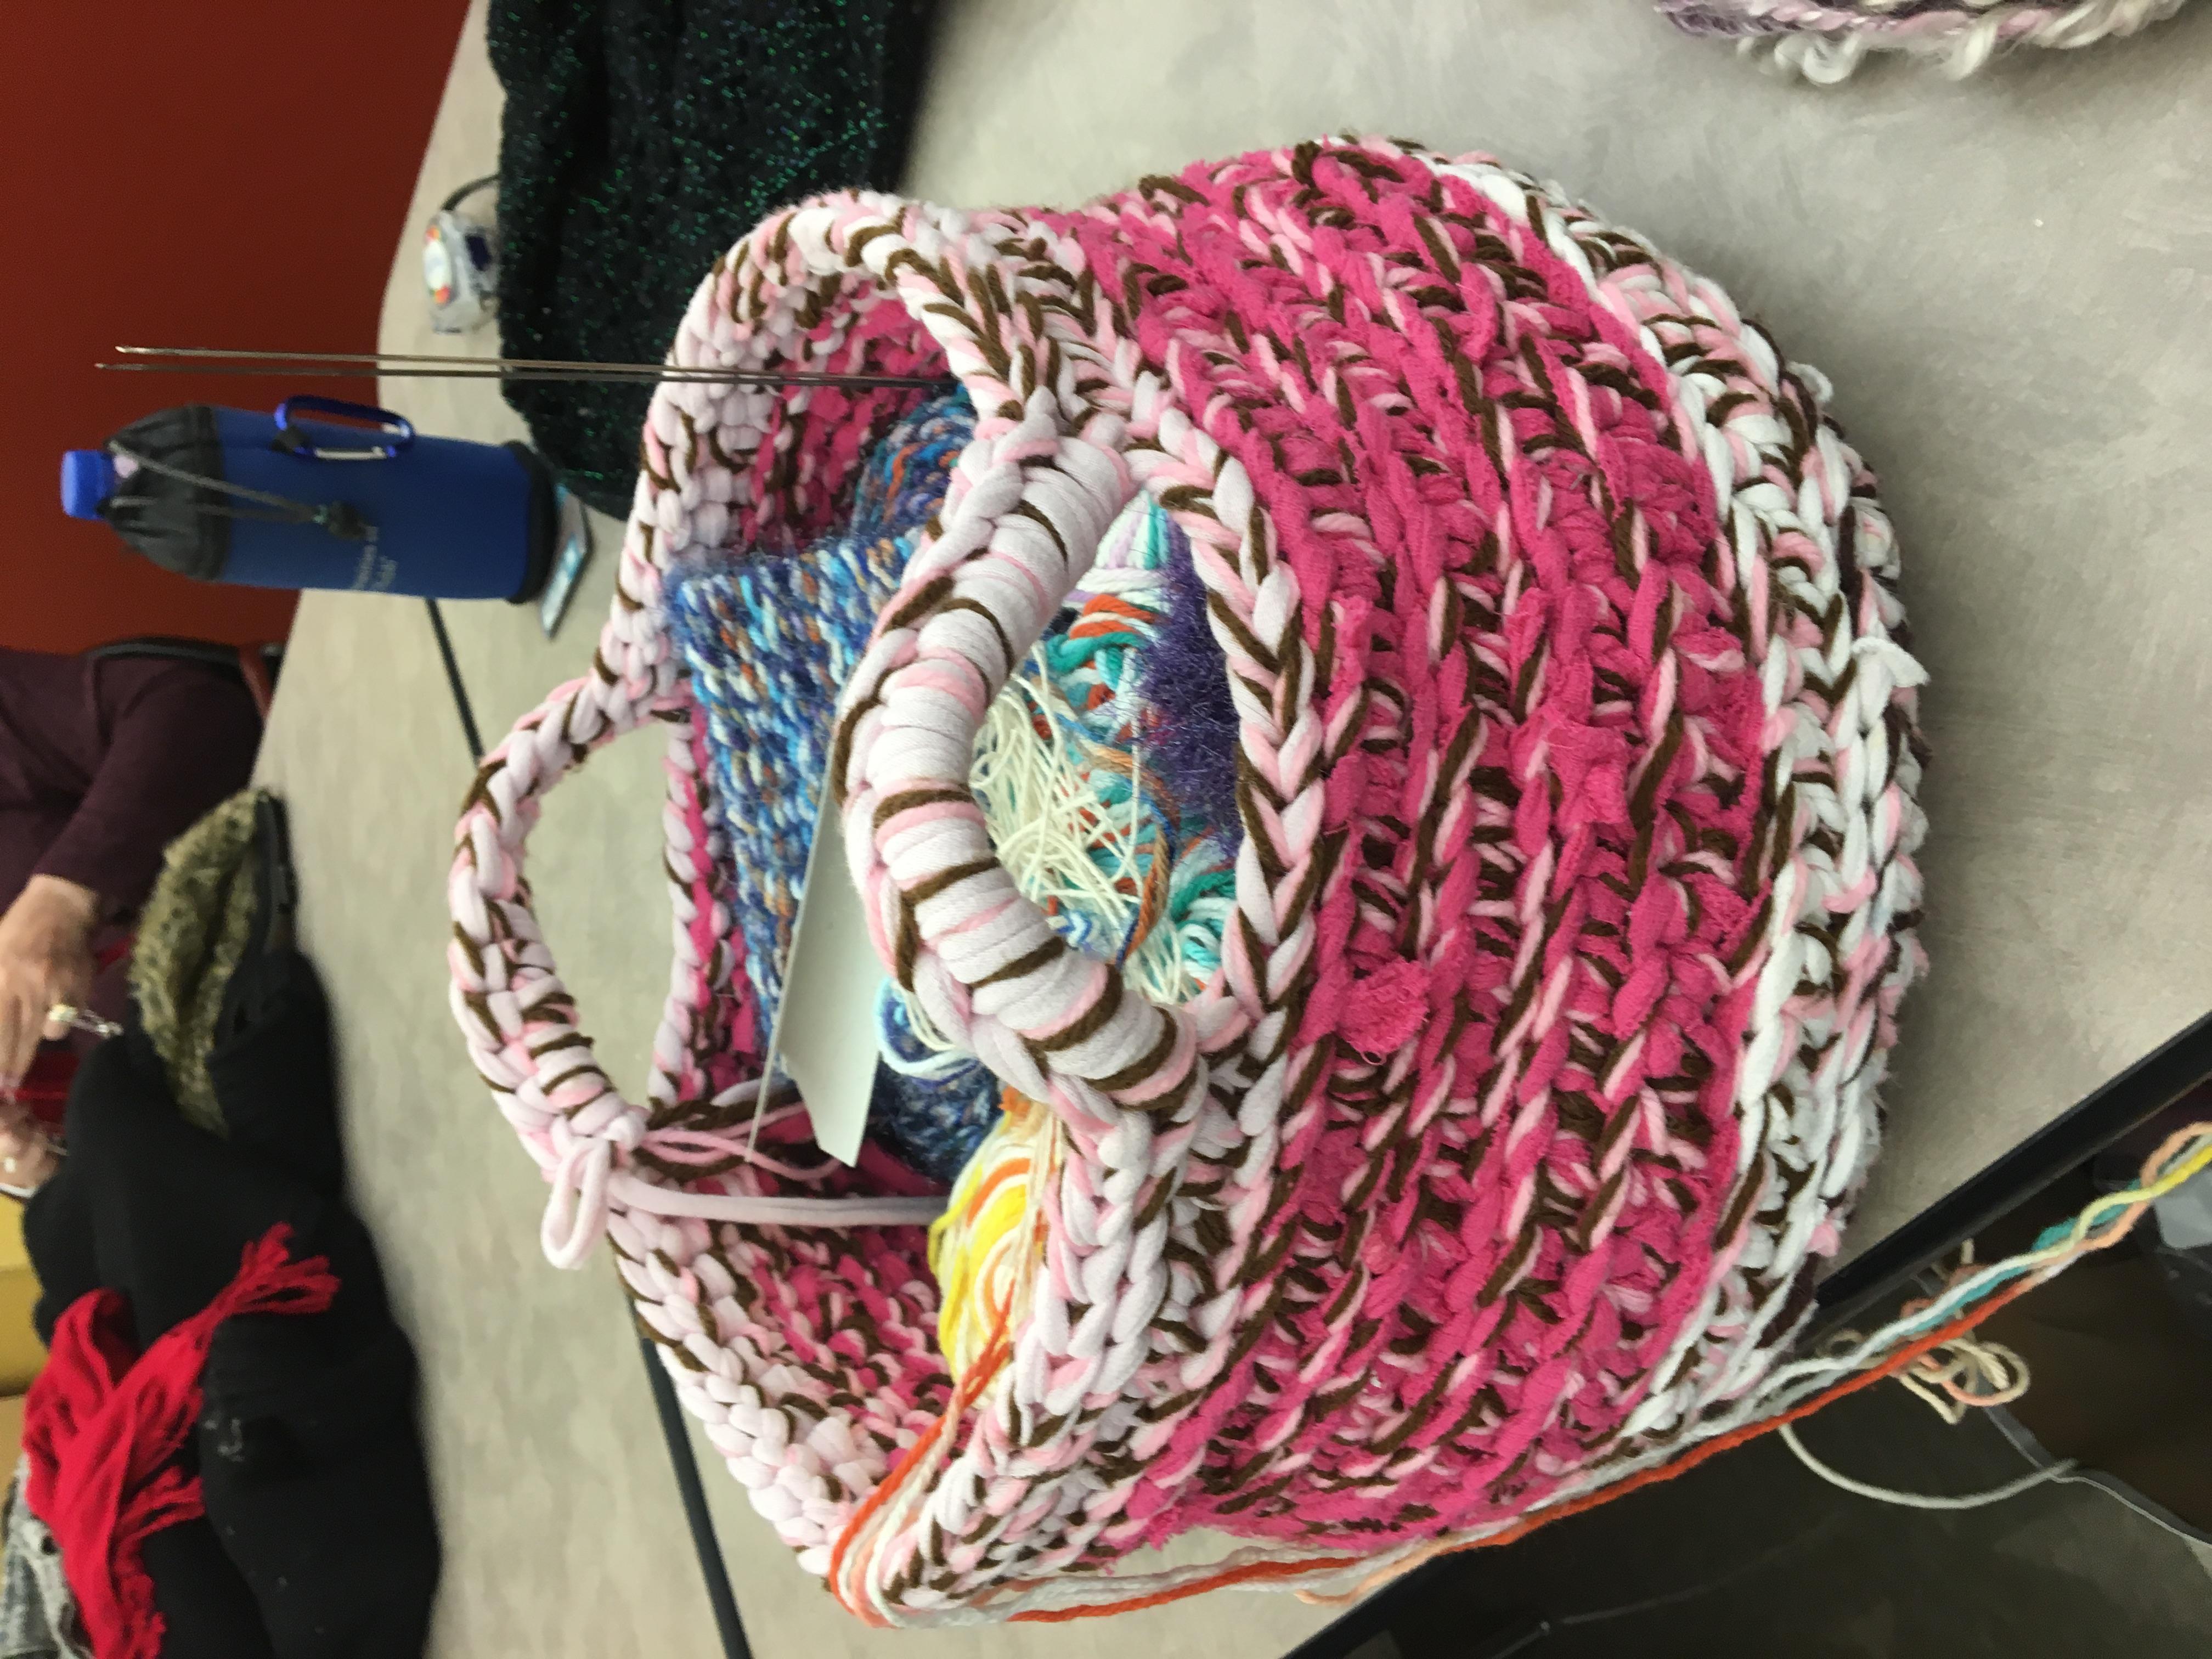 Woven Fiber Basket by Annette McKee